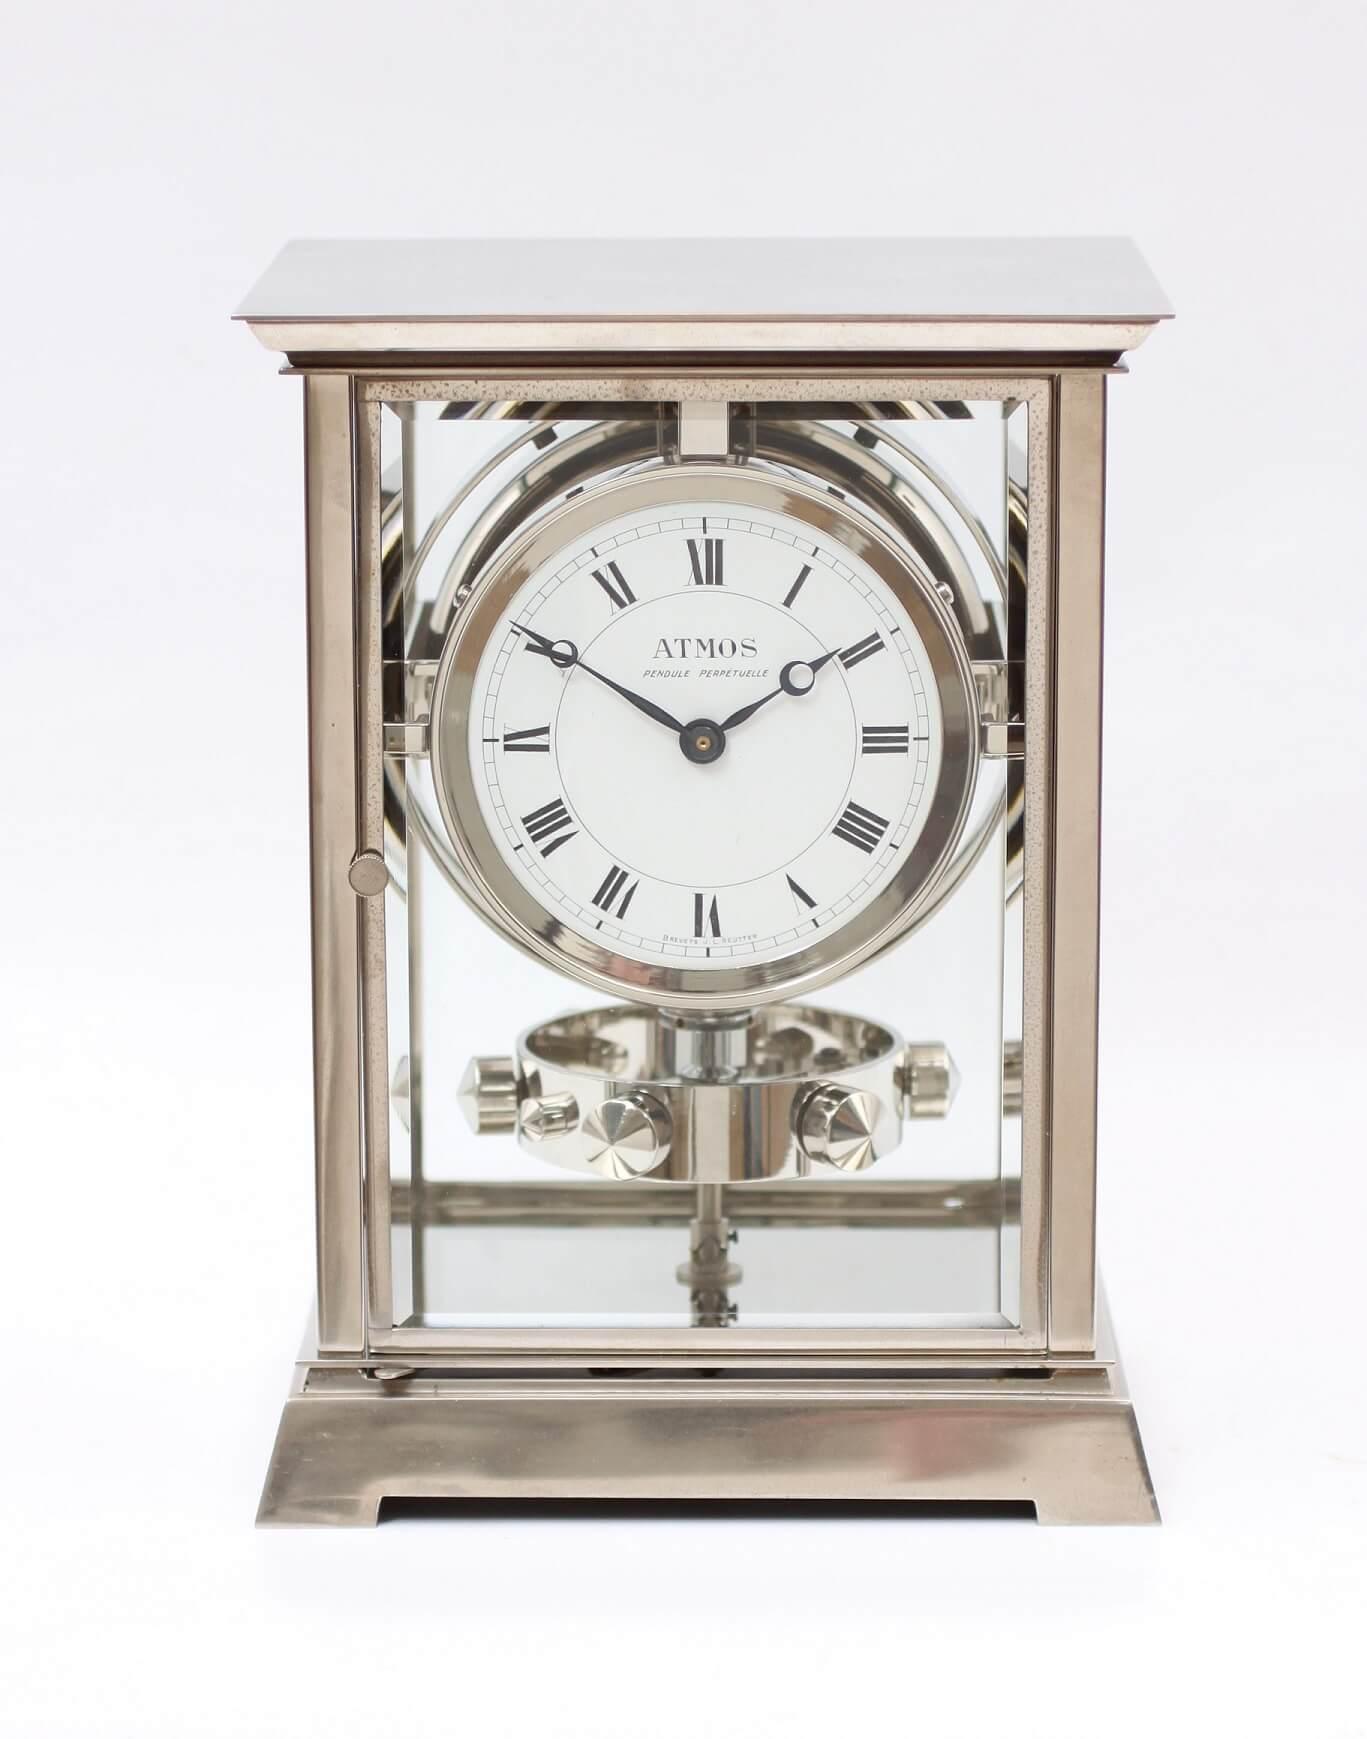 French-Reutter-nickel plated-atmos clock-Jean Louis Reutter-art deco